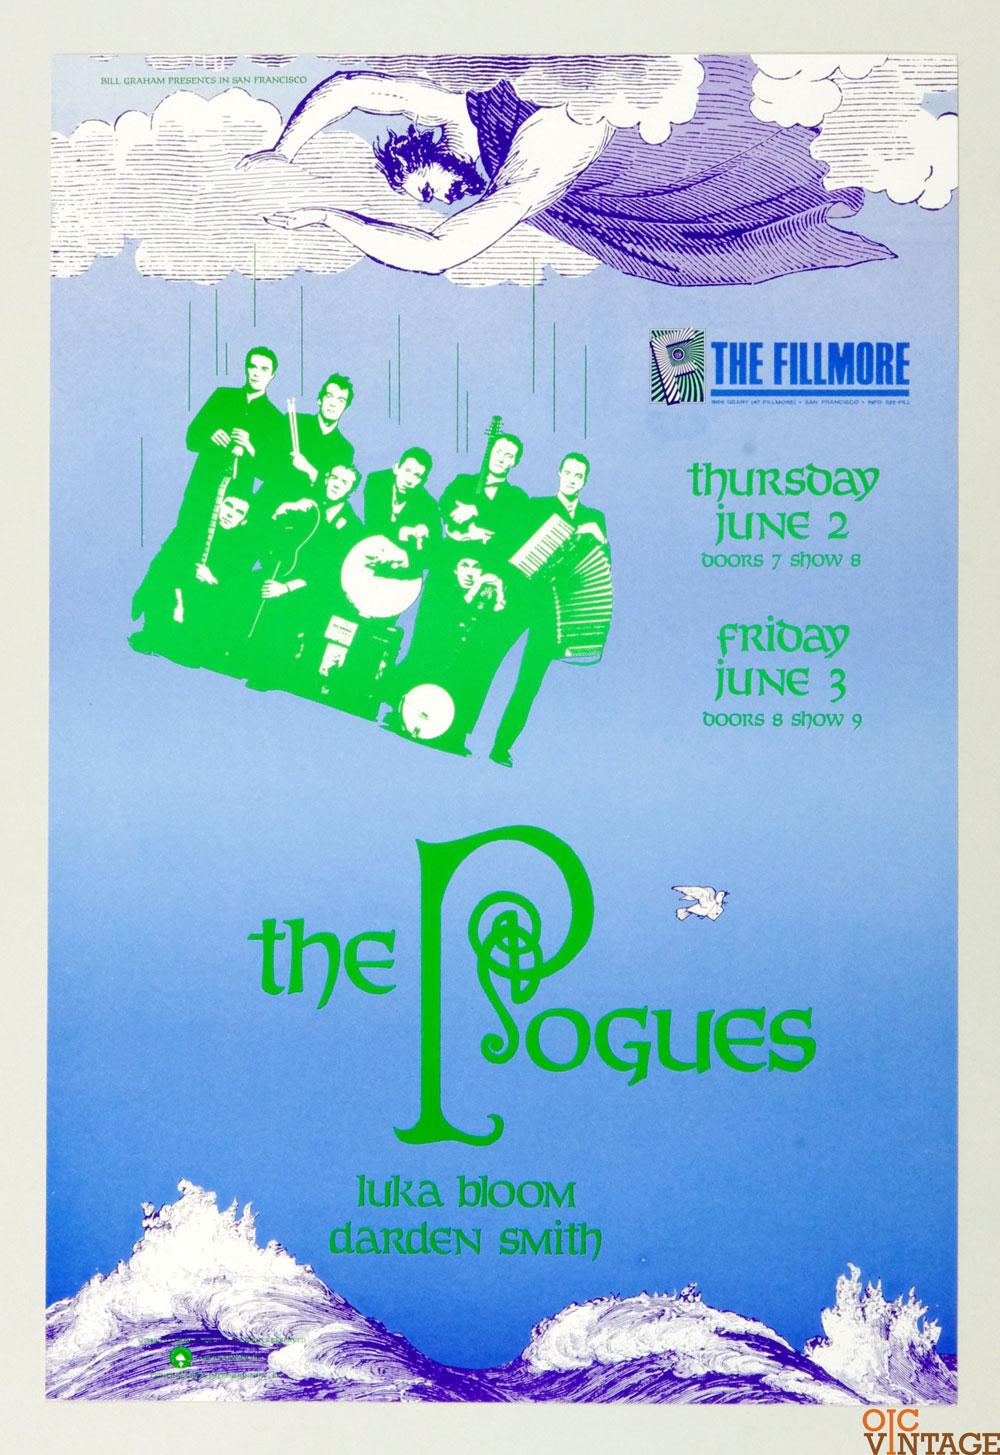 The Pogues Luka Bloom Daren Smith Poster 1988 Jun 3 New Fillmore